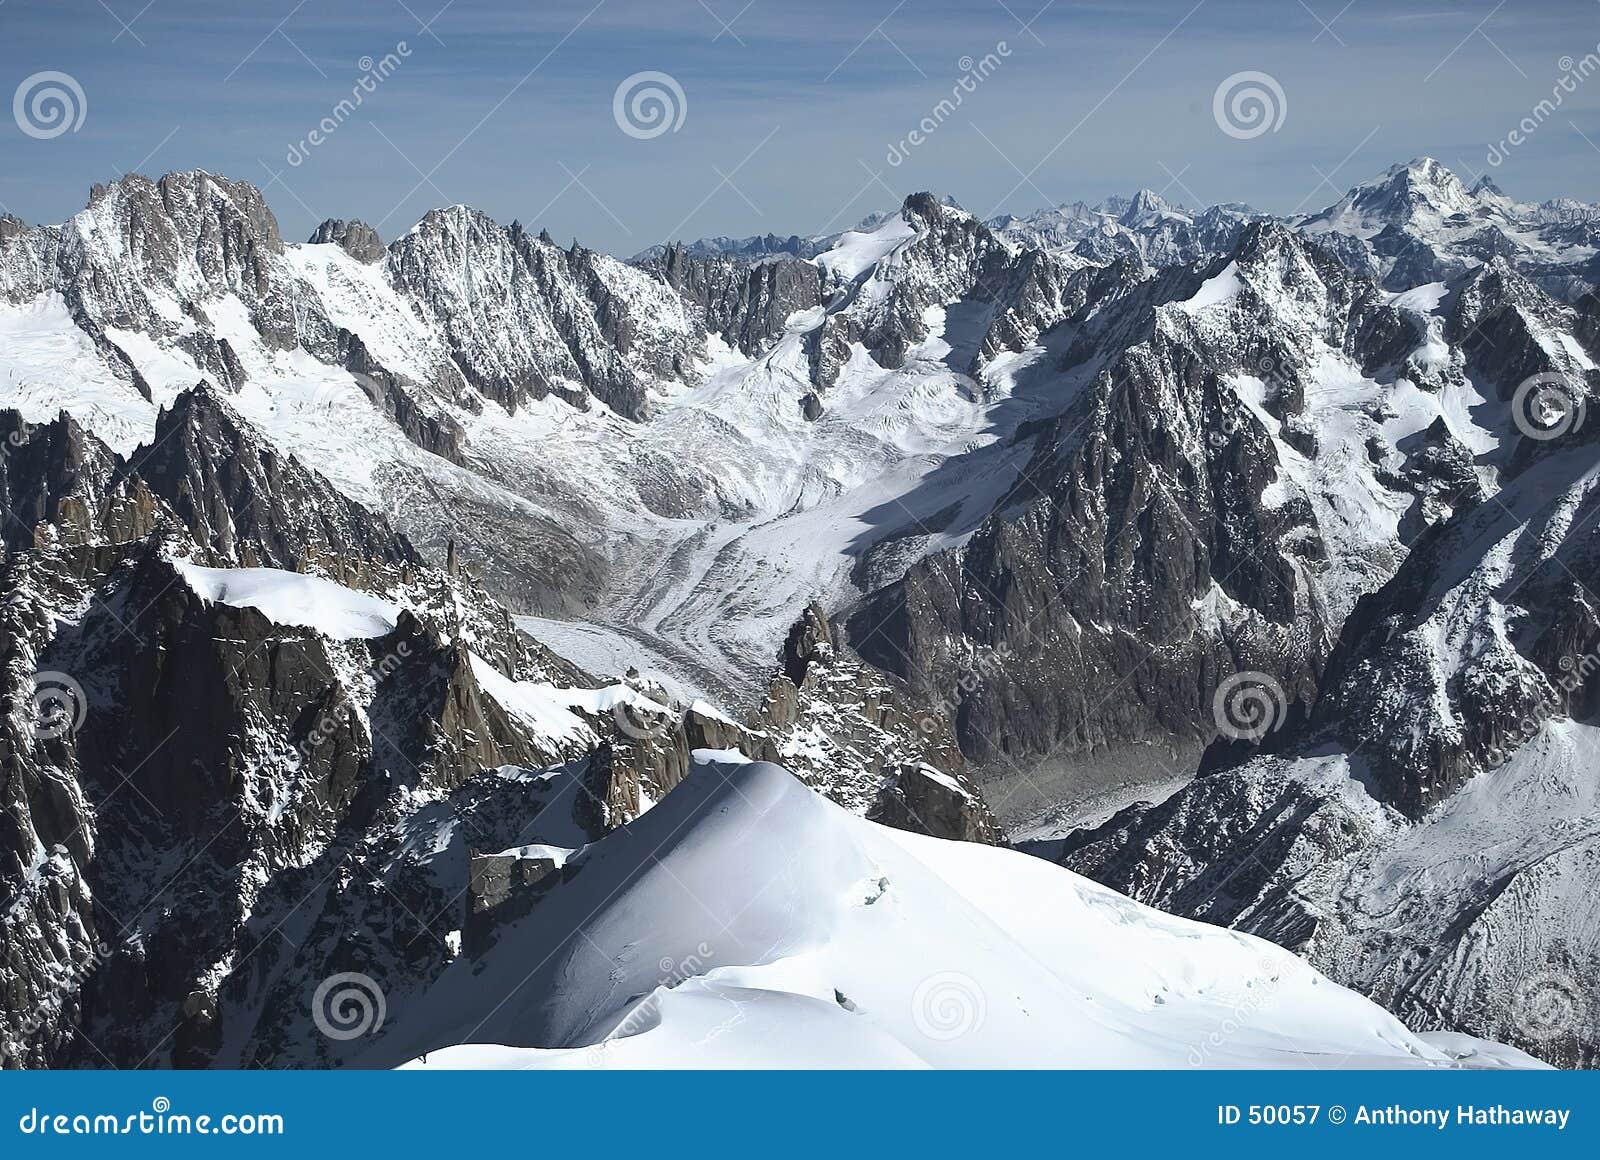 Cena alpina francesa